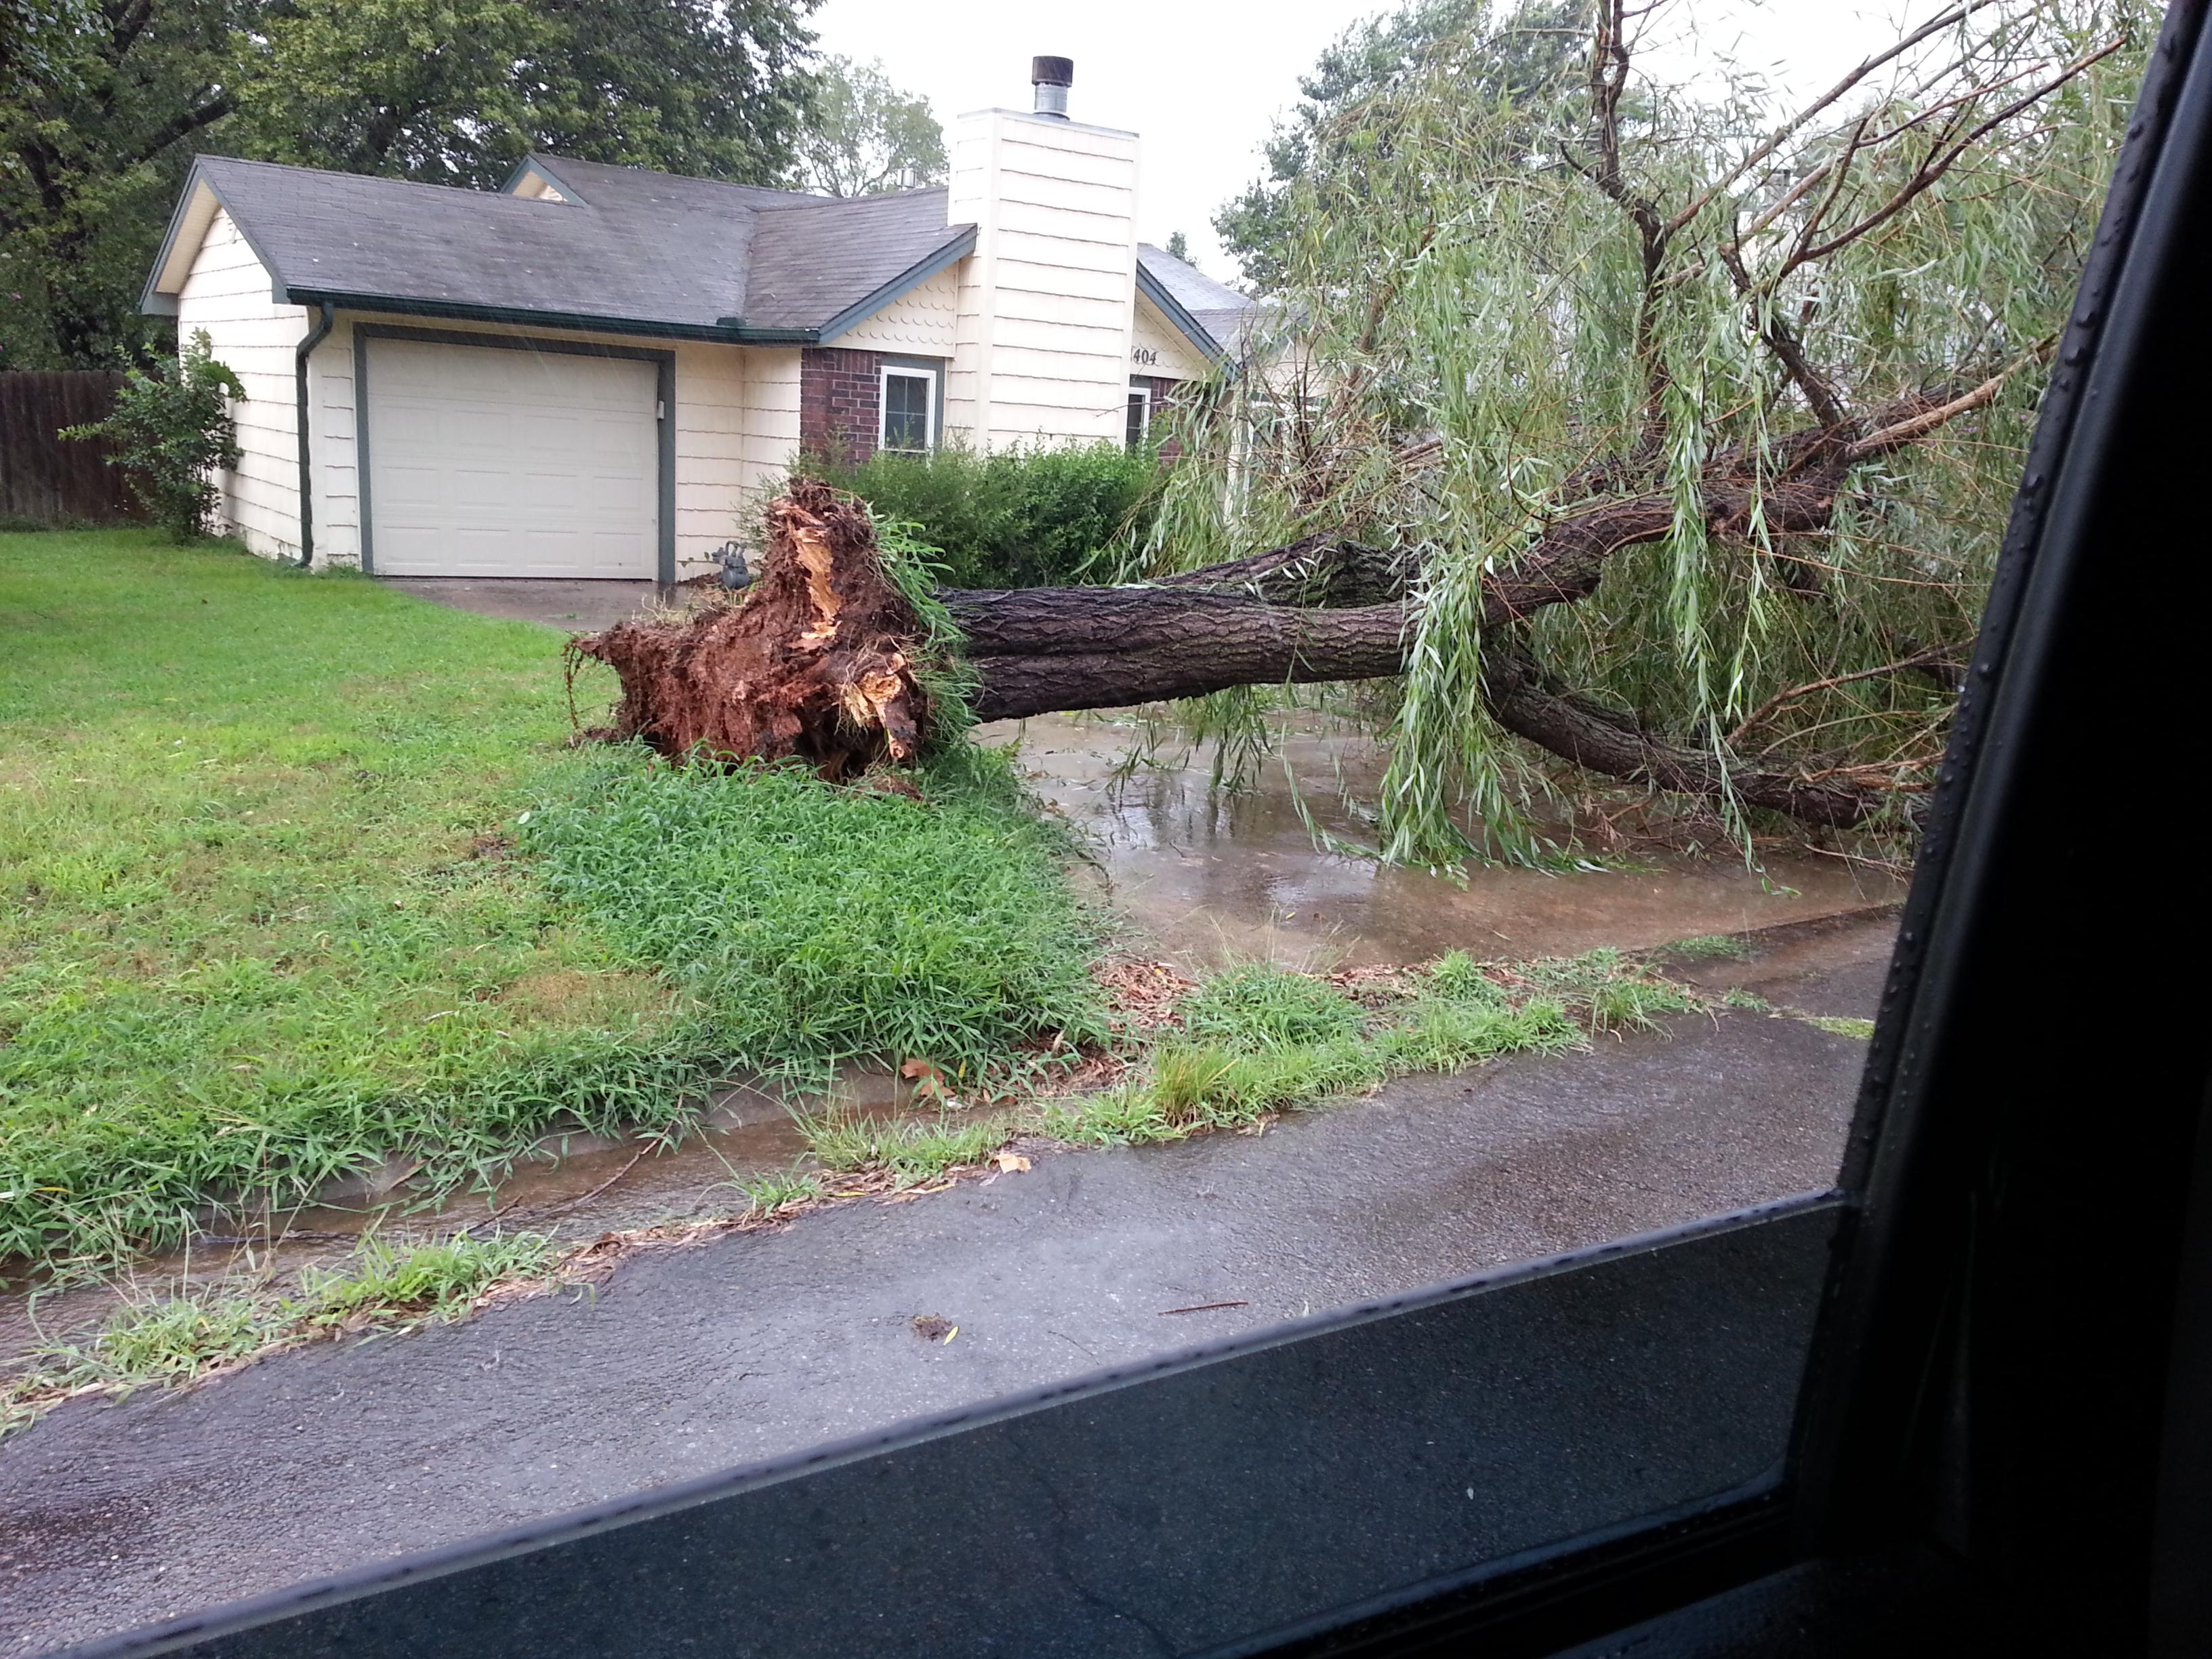 Van Buren, tree down. Courtesy Mike Brasuell